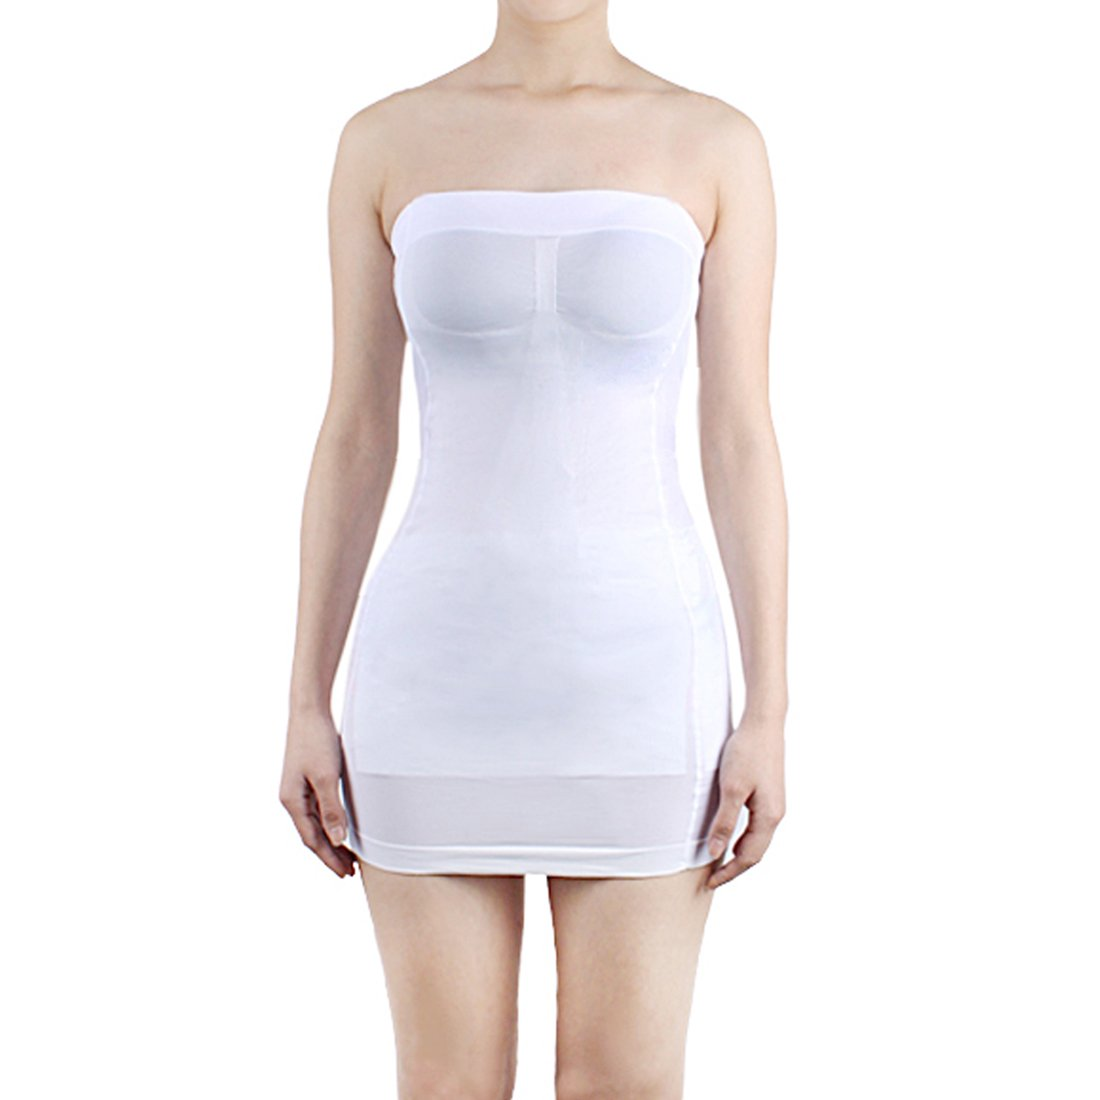 2a09e0a9eb2 Andux Sexy Slimming Tube Top Stretch Strapless Slip Mini Dress SS-W03  White  Amazon.co.uk  Sports   Outdoors